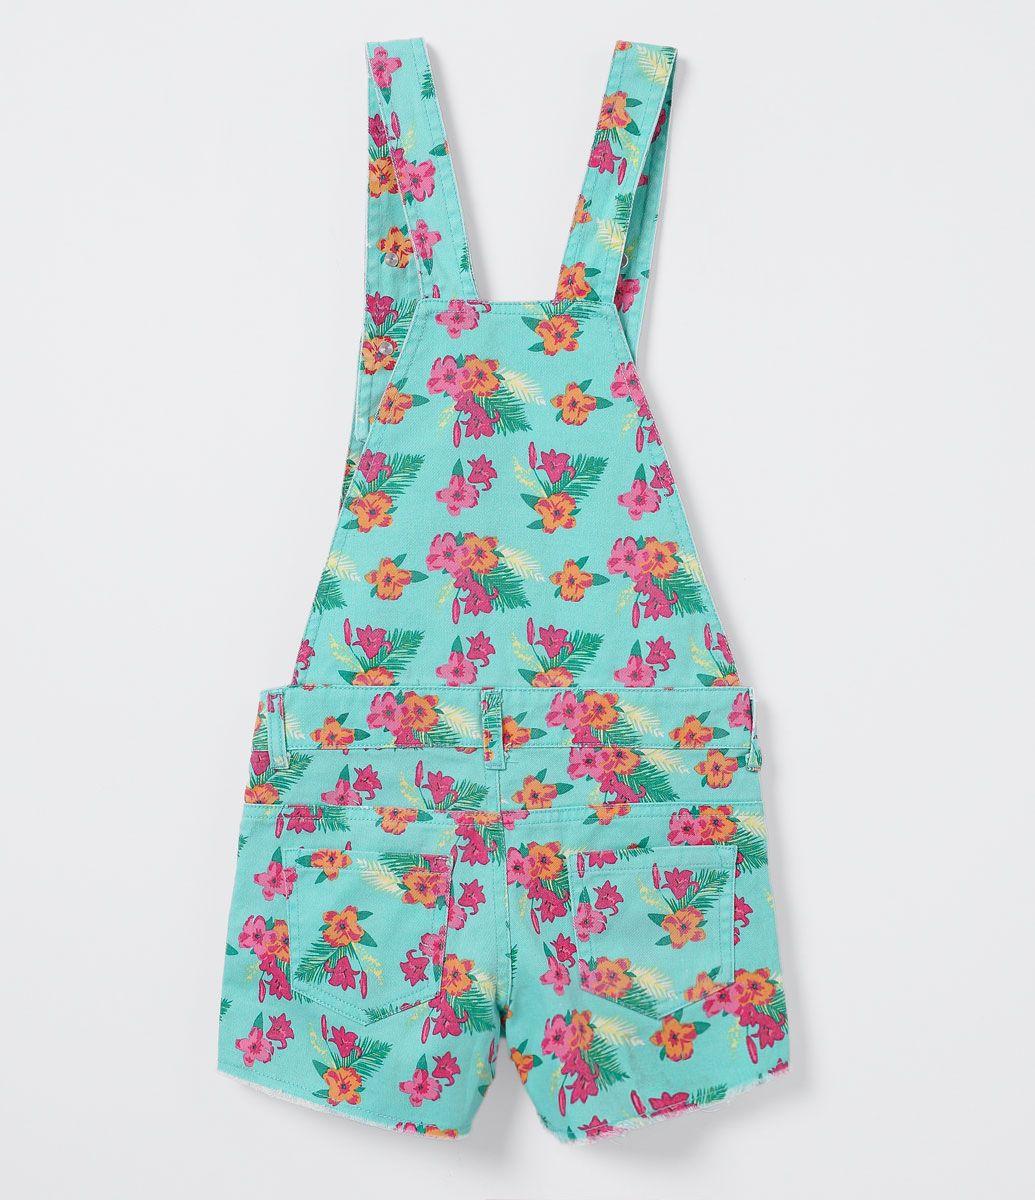 785b7dea87 Jardineira Infantil Estampa Polly - Tam 4 a 12 anos - Lojas Renner ...